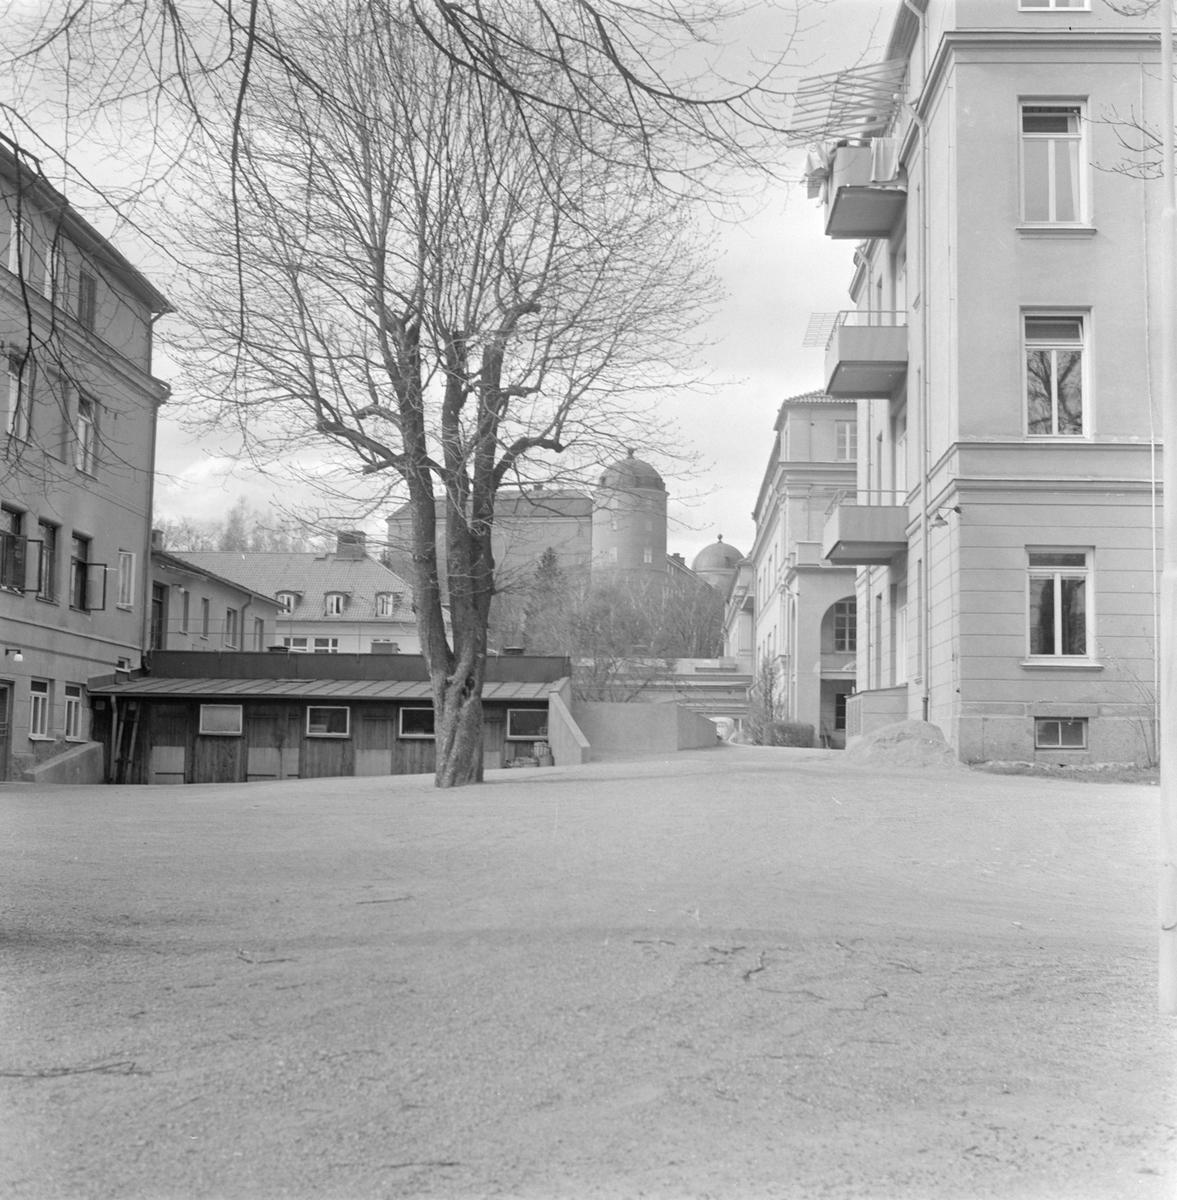 Sjuksköterskehem vid Akademiska sjukhuset, kvarteret Sjukhuset, Fjärdingen, Uppsala 1958